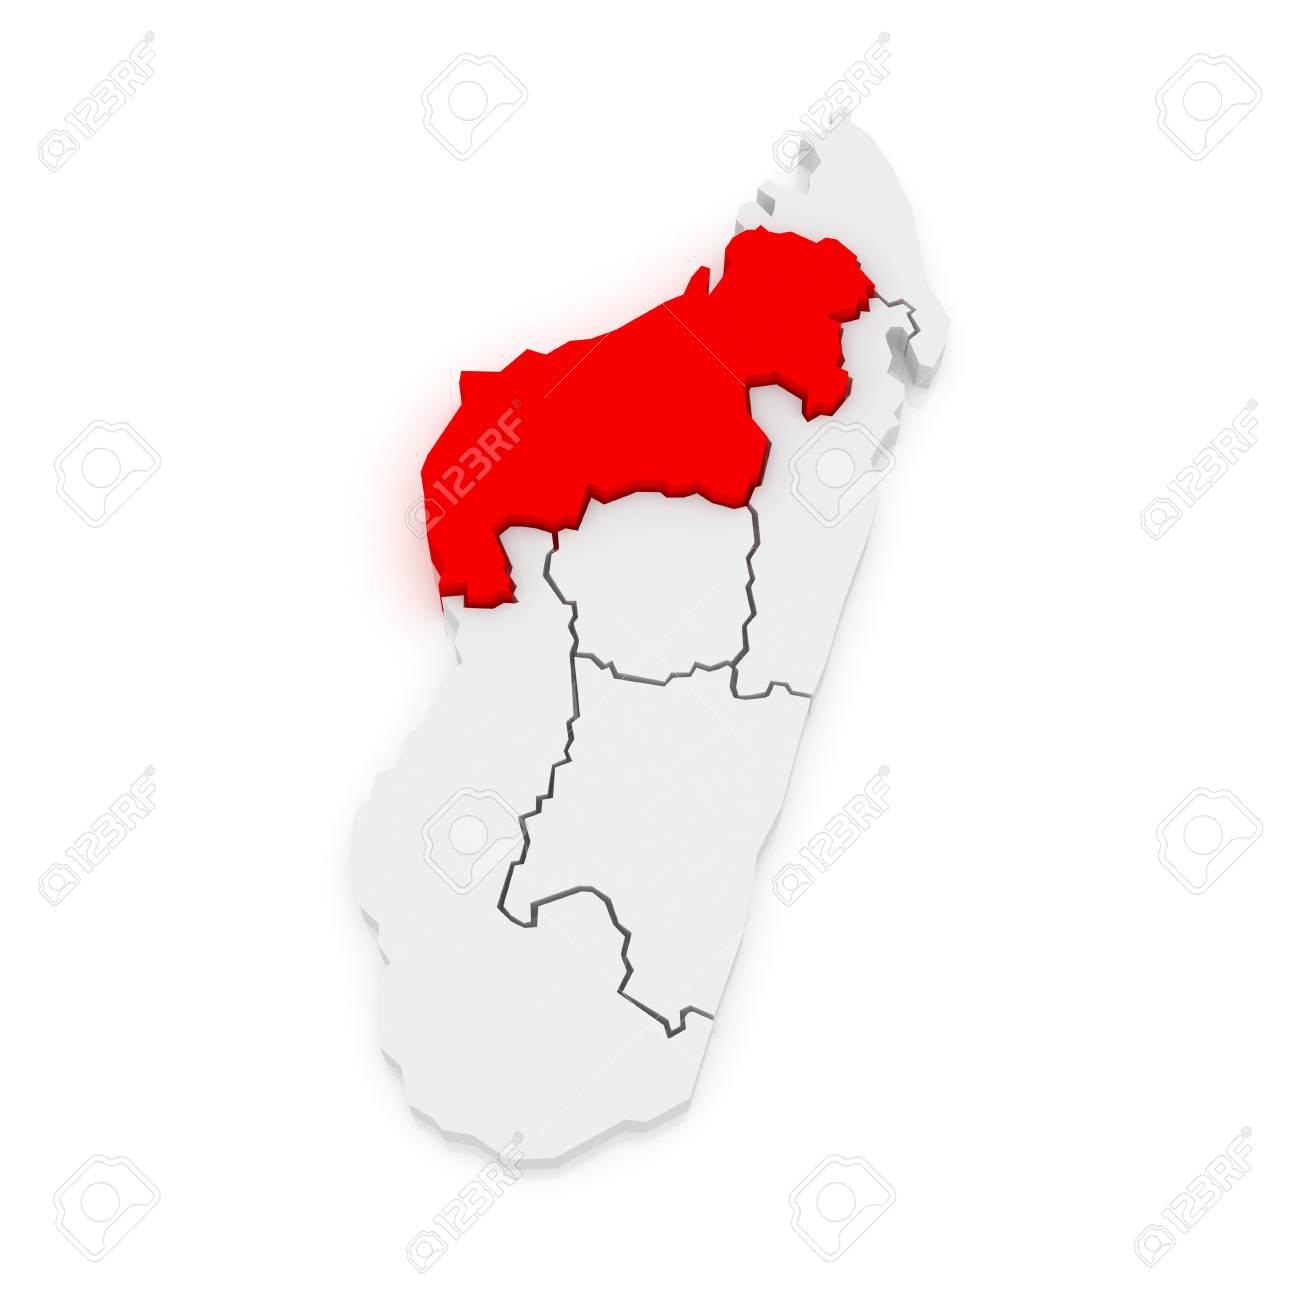 Map Of Mahajanga Madagascar 3d Stock Photo Picture And Royalty